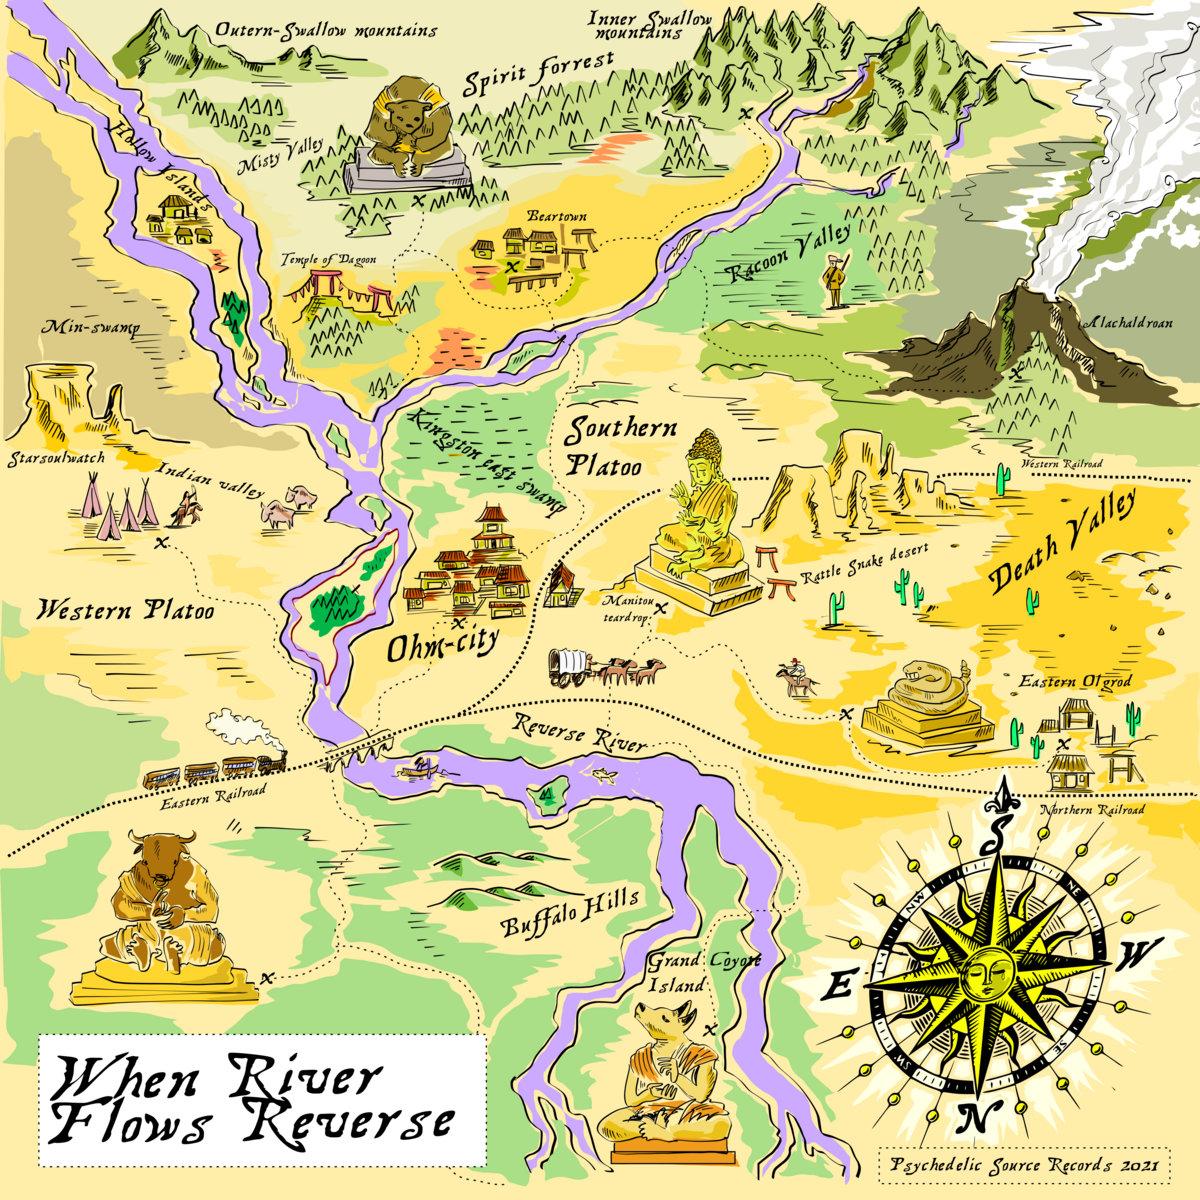 River Flows Reverse When River Flows Reverse